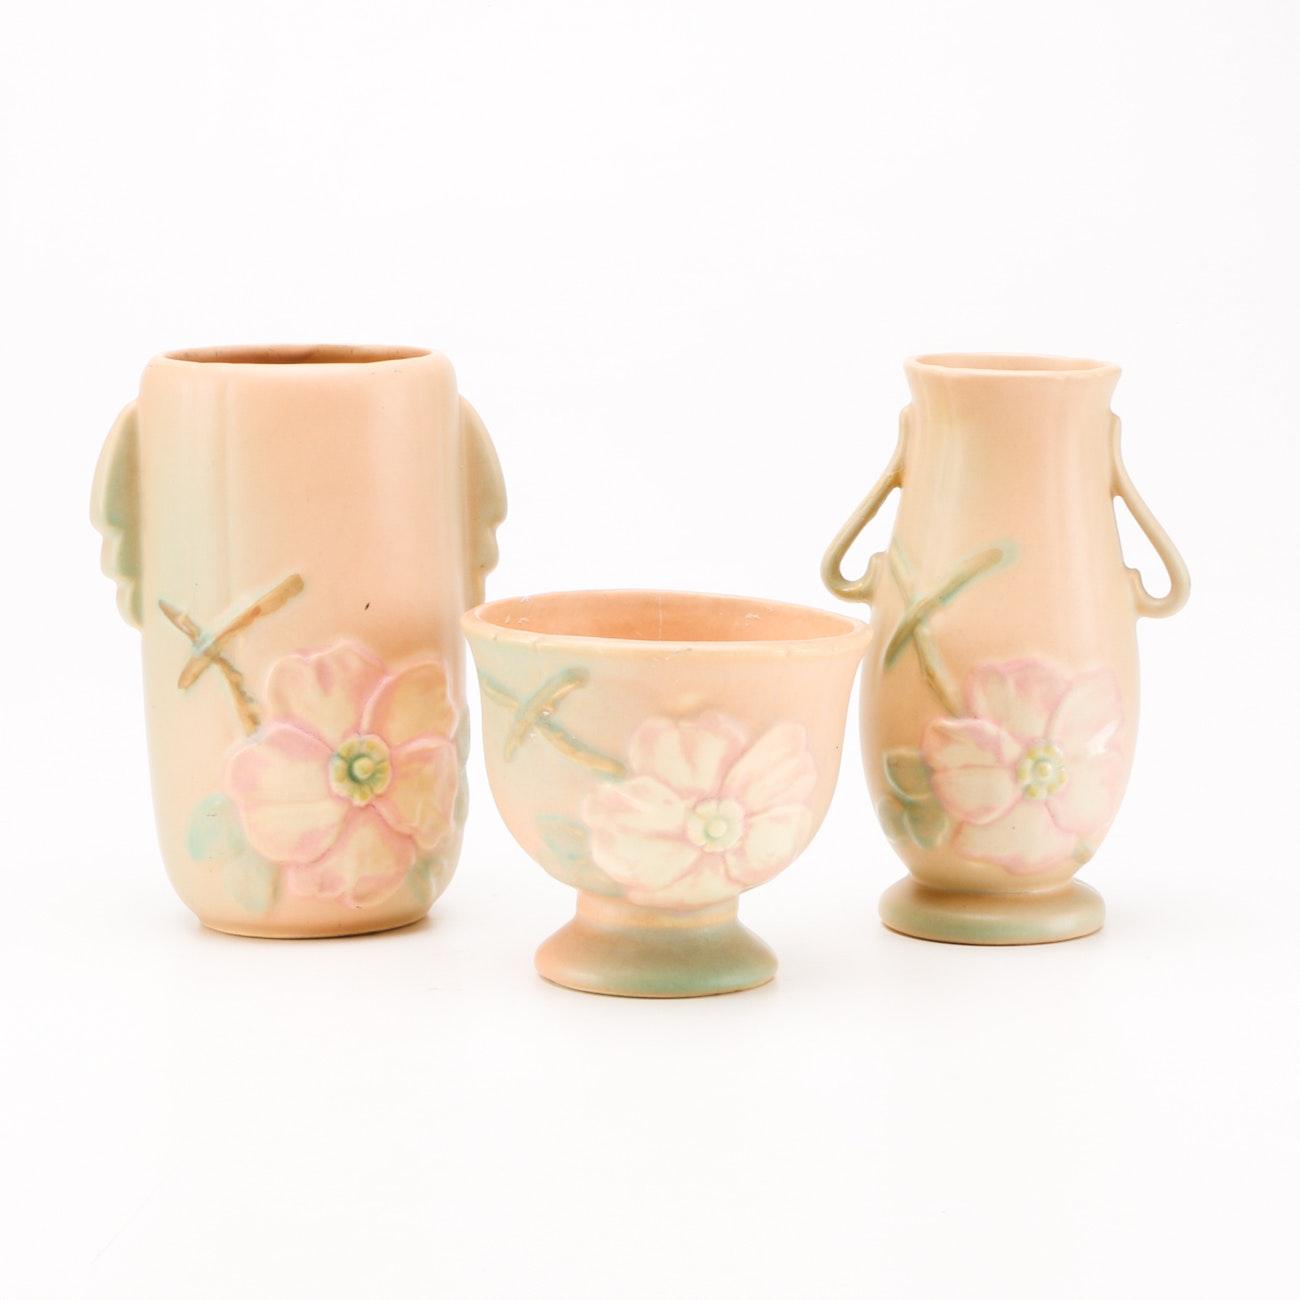 "Assorted 1940s-1950s Weller ""Wild Rose"" Art Pottery"